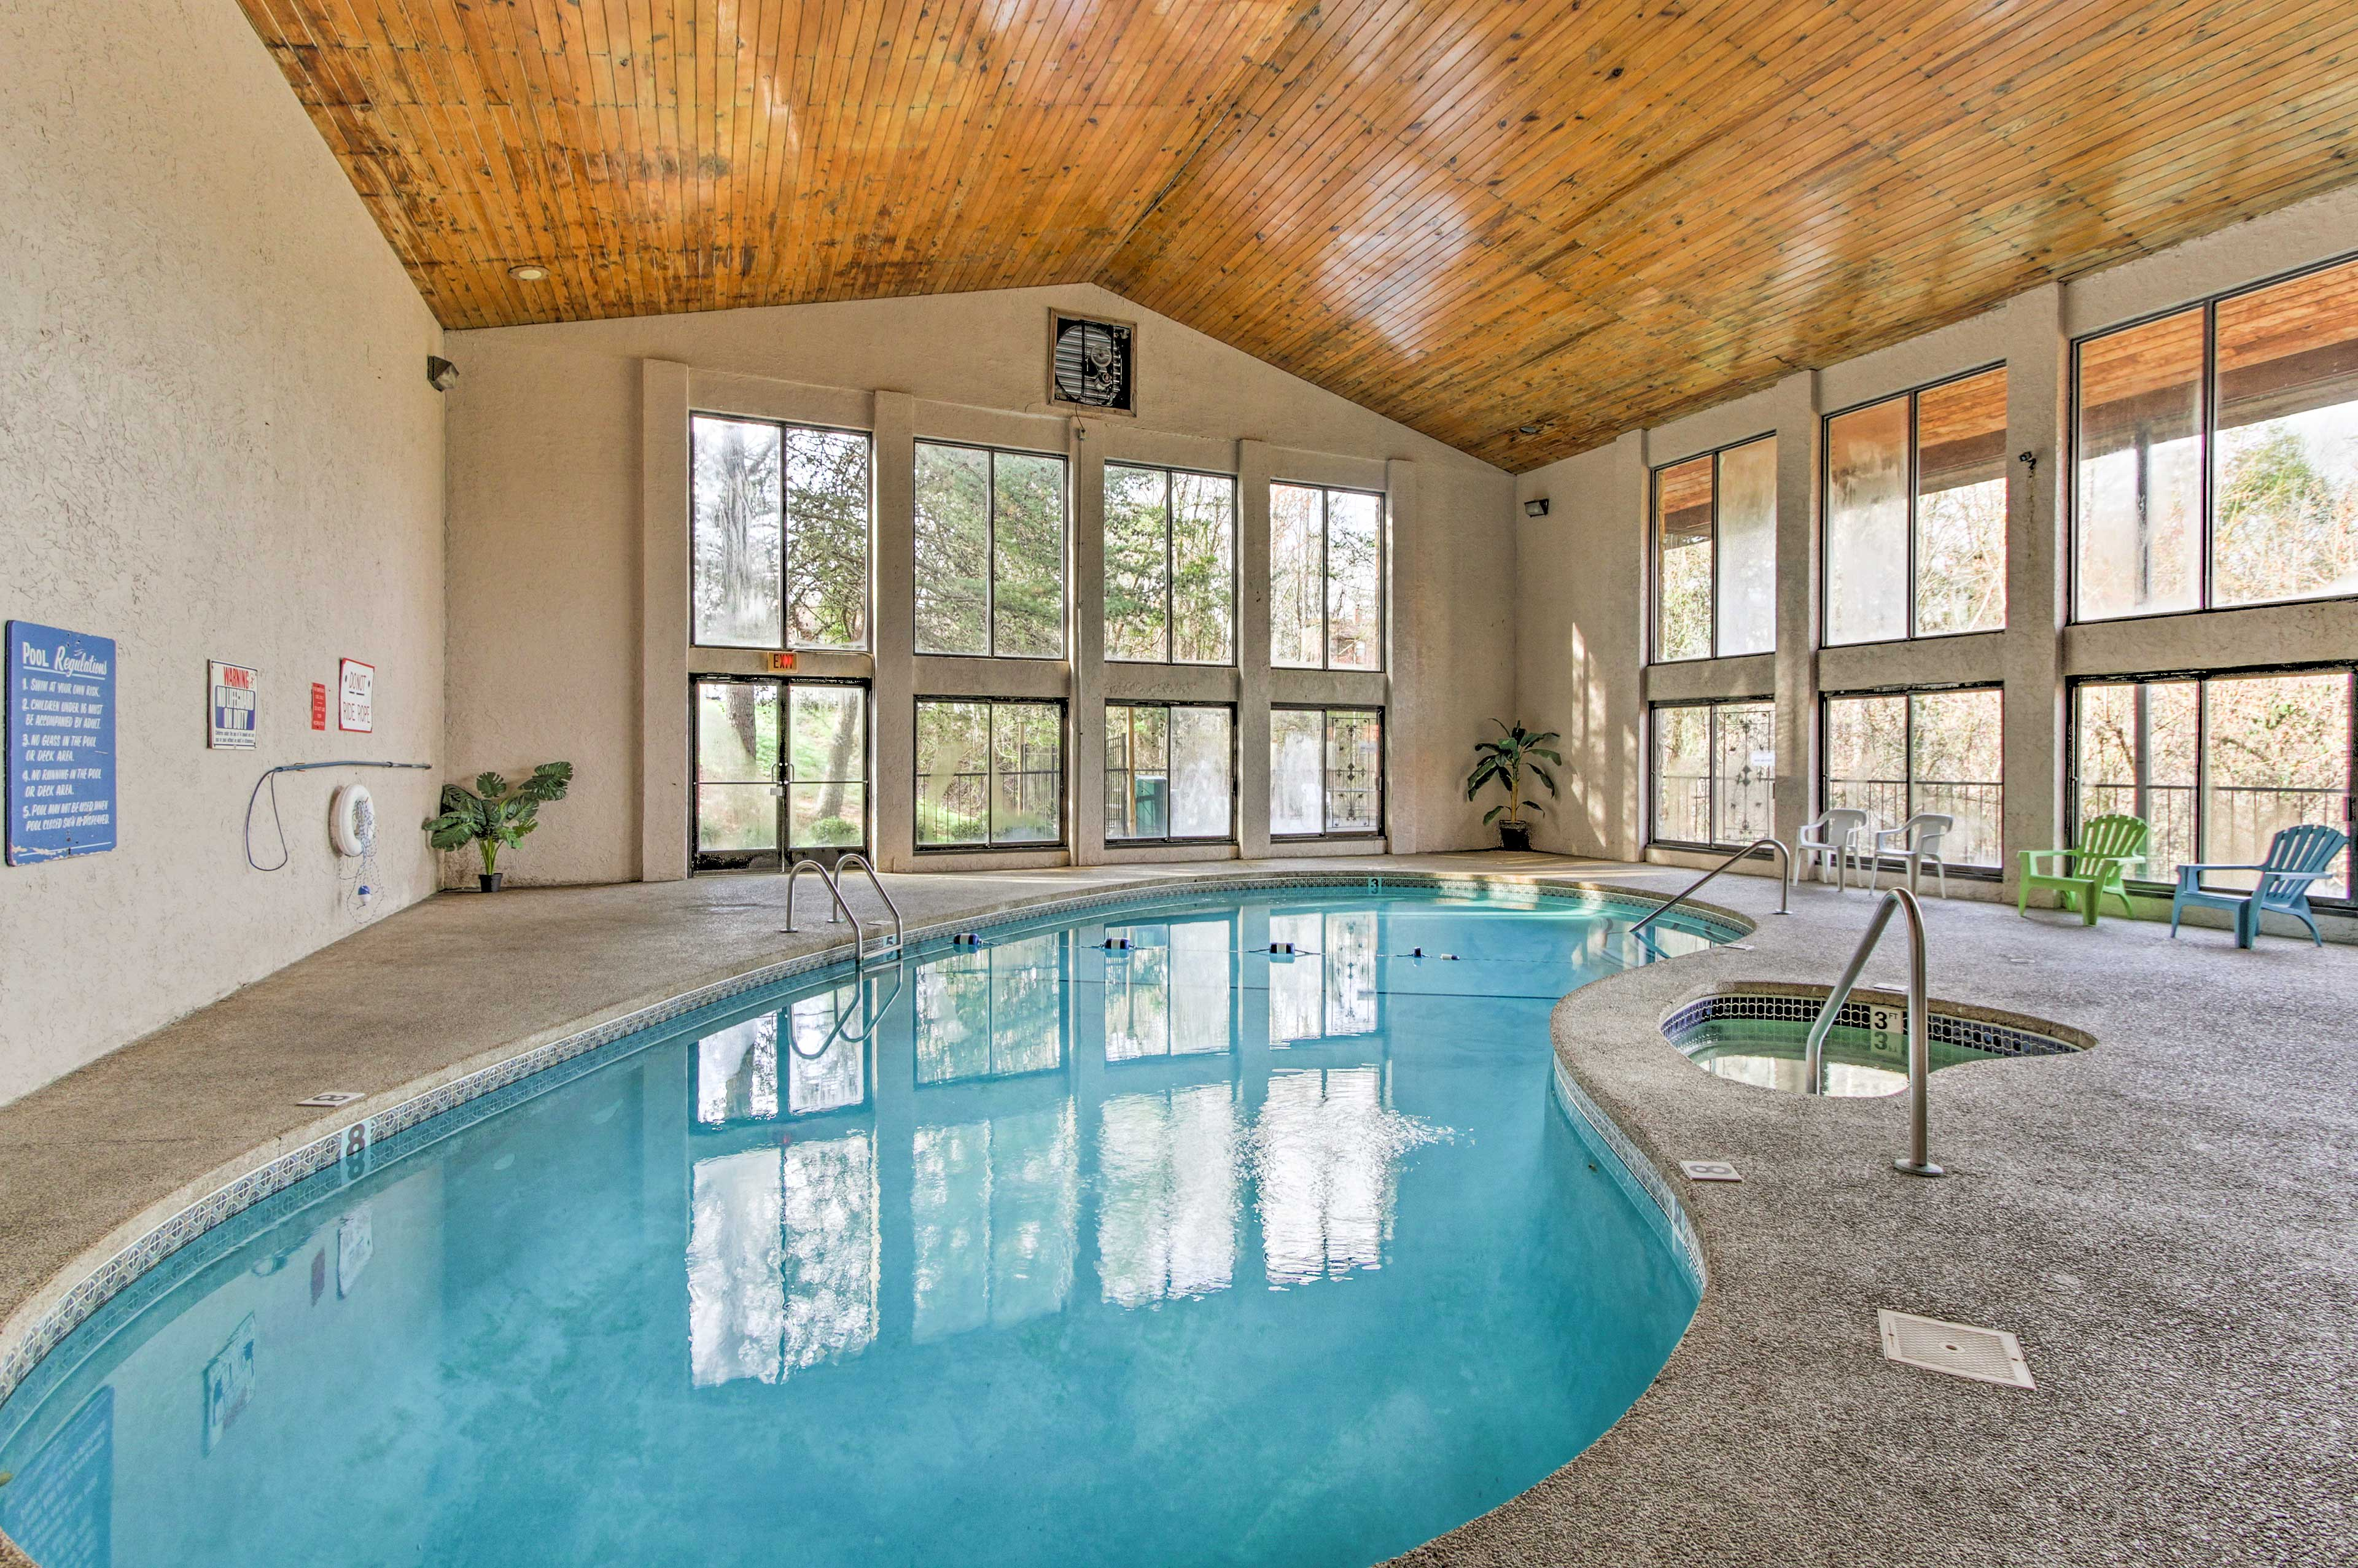 Splash around in the pool or soak in the hot tub!